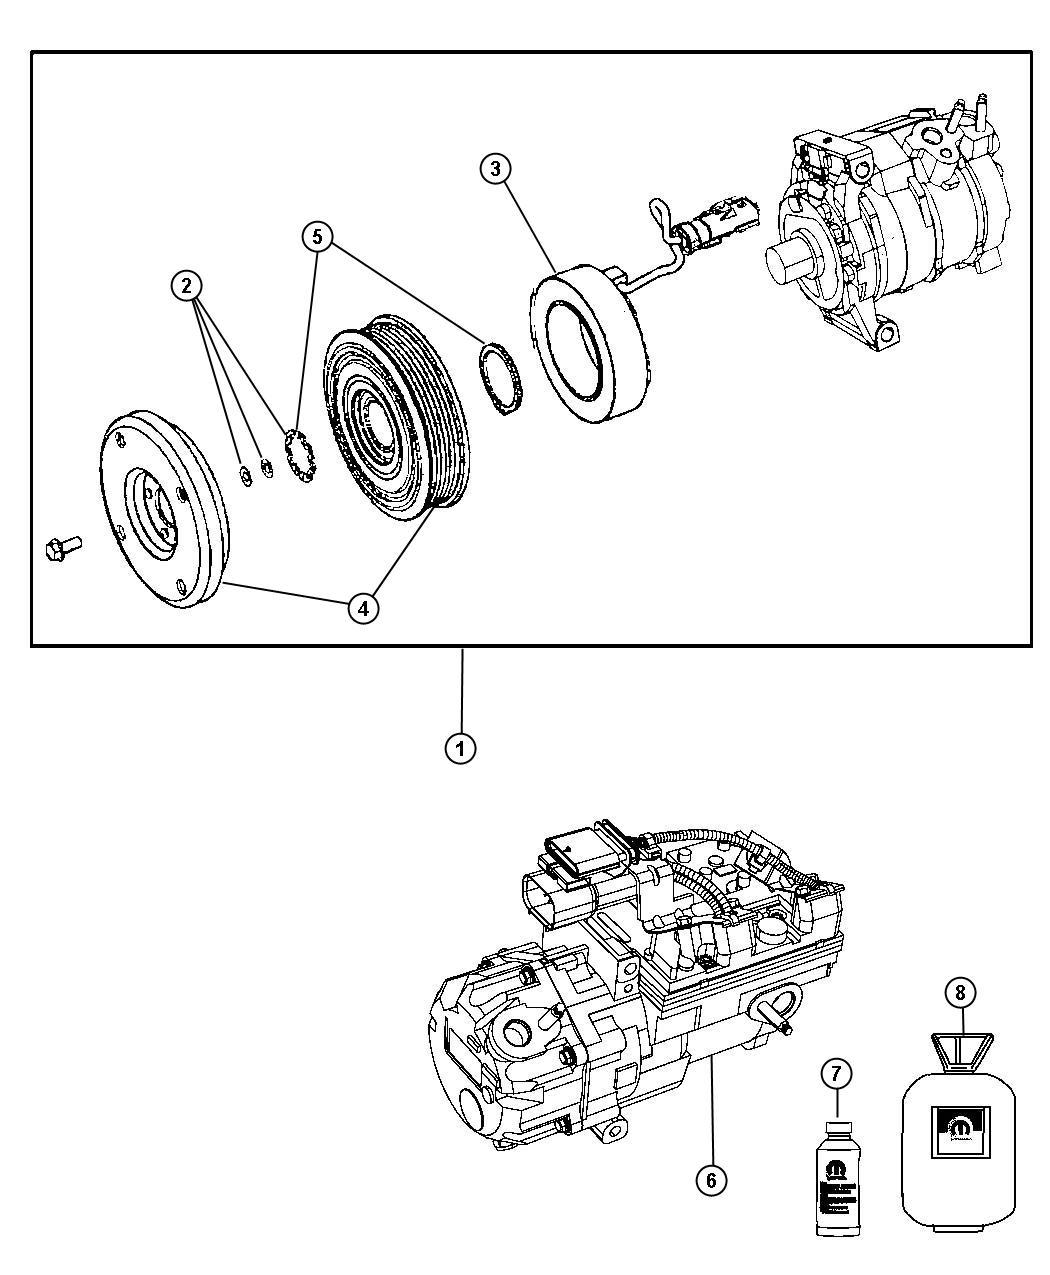 Dodge Durango Lubricant. A/c compressor. 250ml. Electric